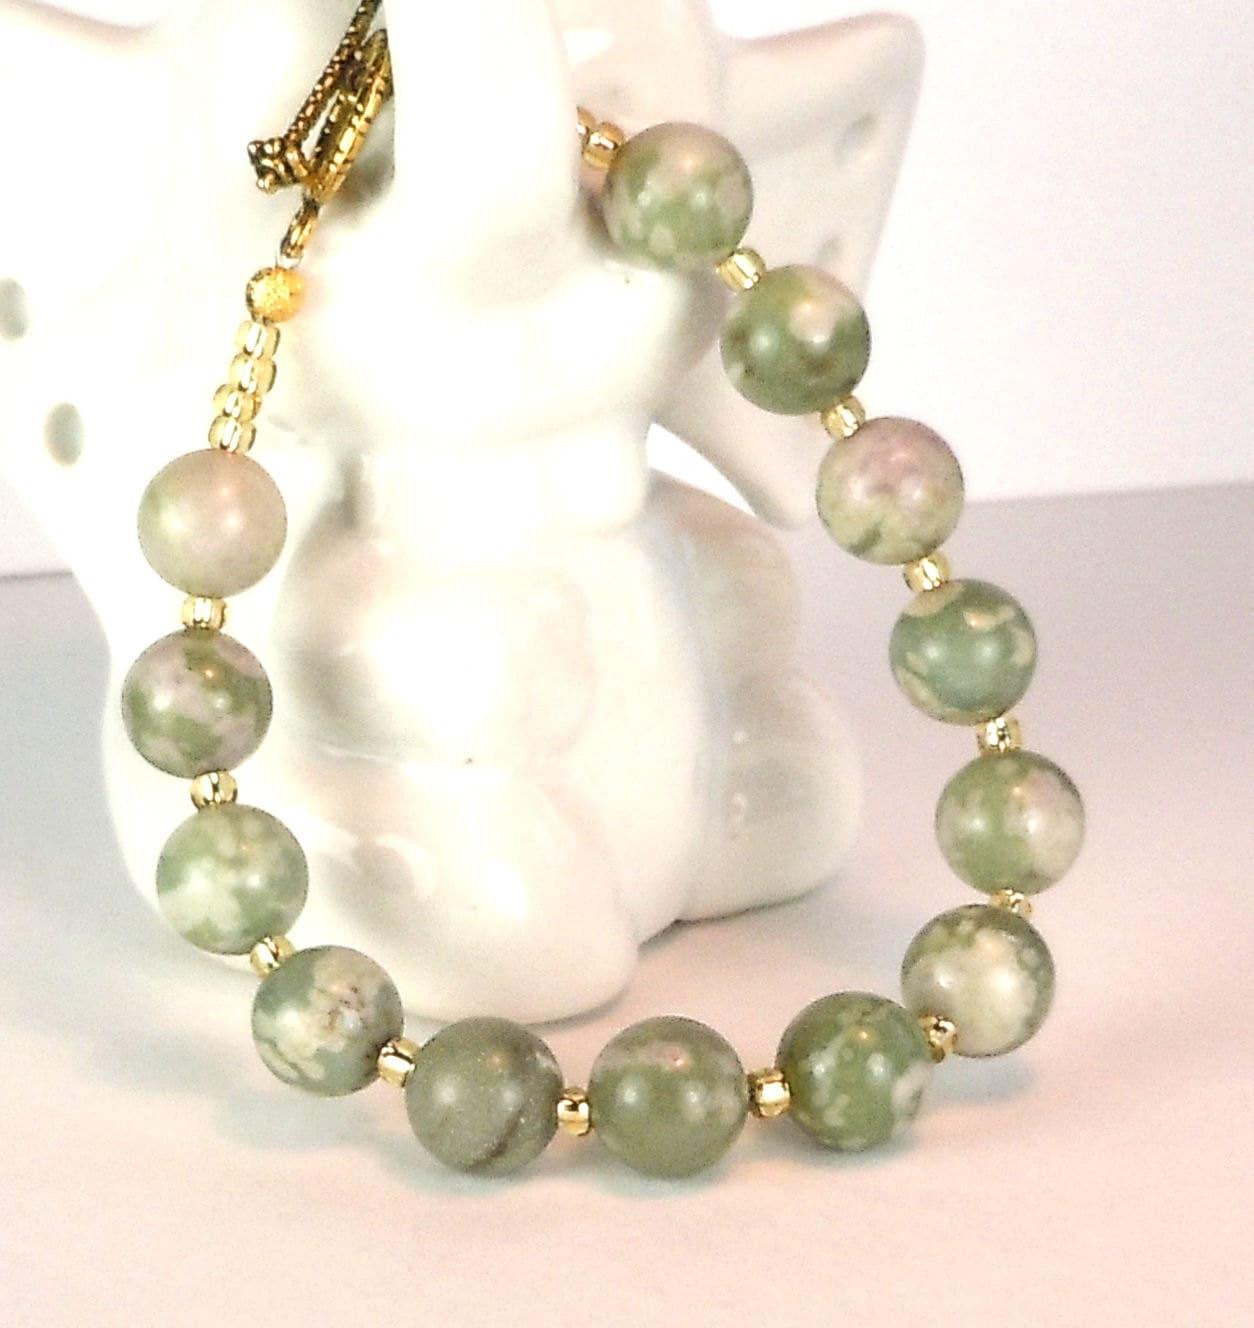 Agate Beaded Bracelet - Seed Beads - Toggle Clasp - BeadingDerby